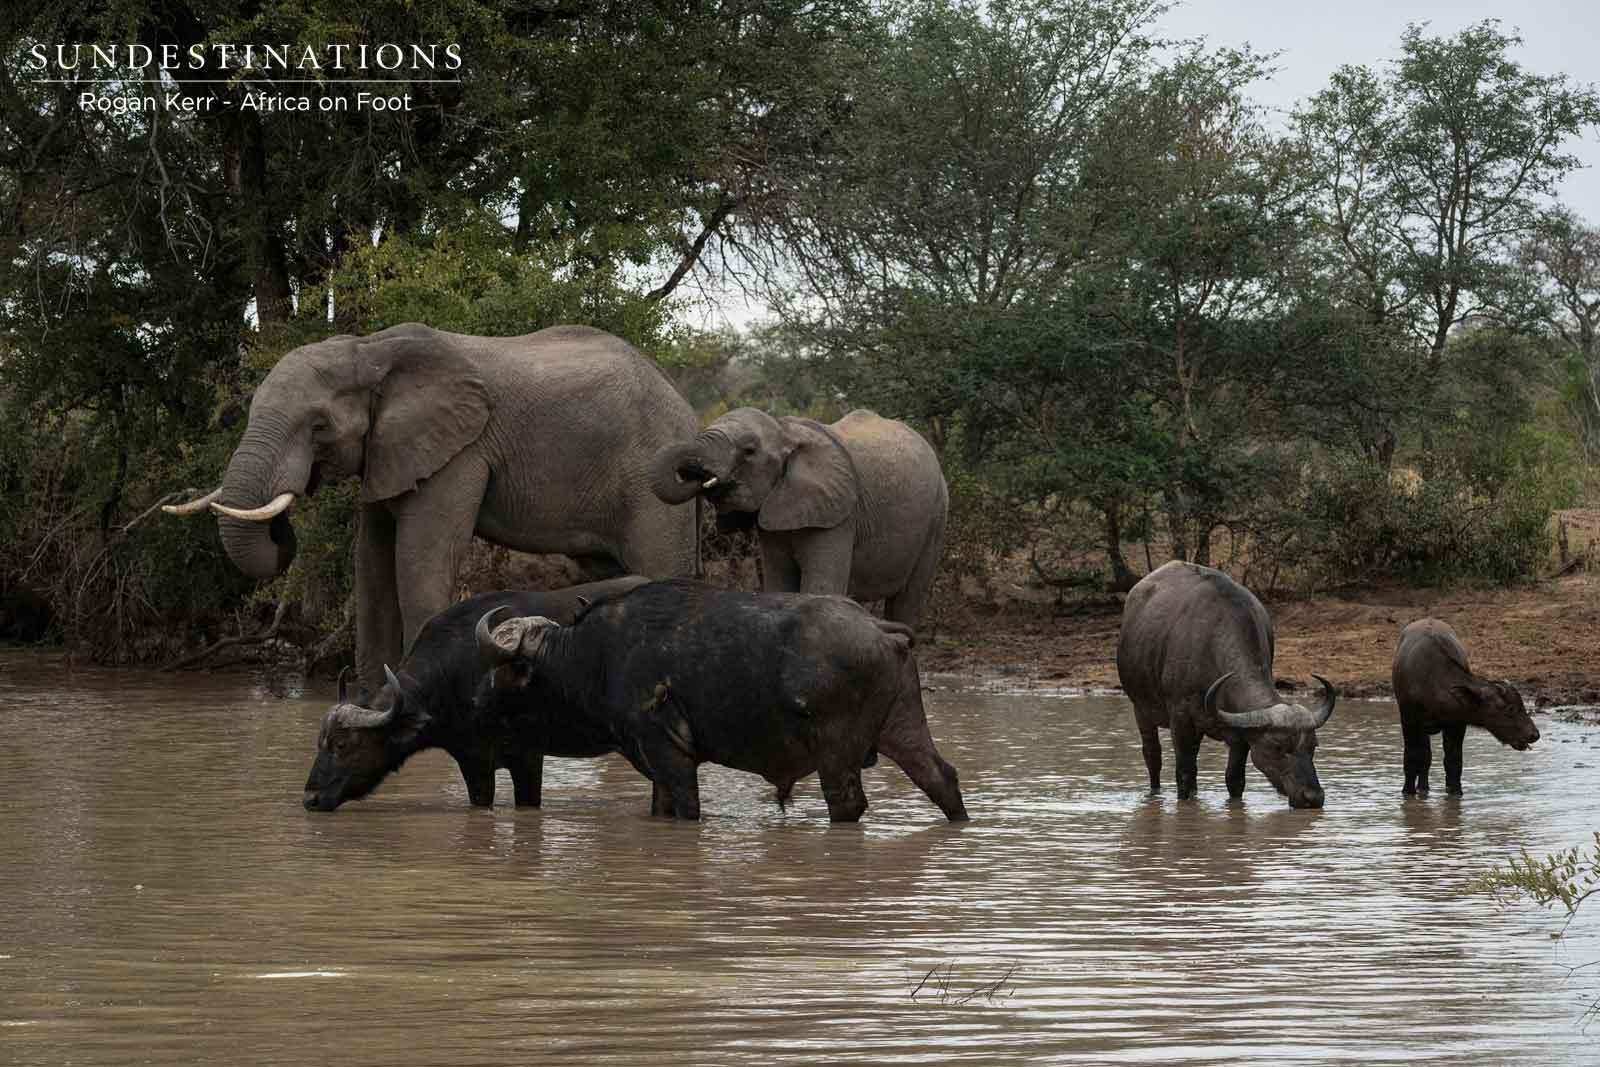 Buffalo and Elephants Africa on Foot